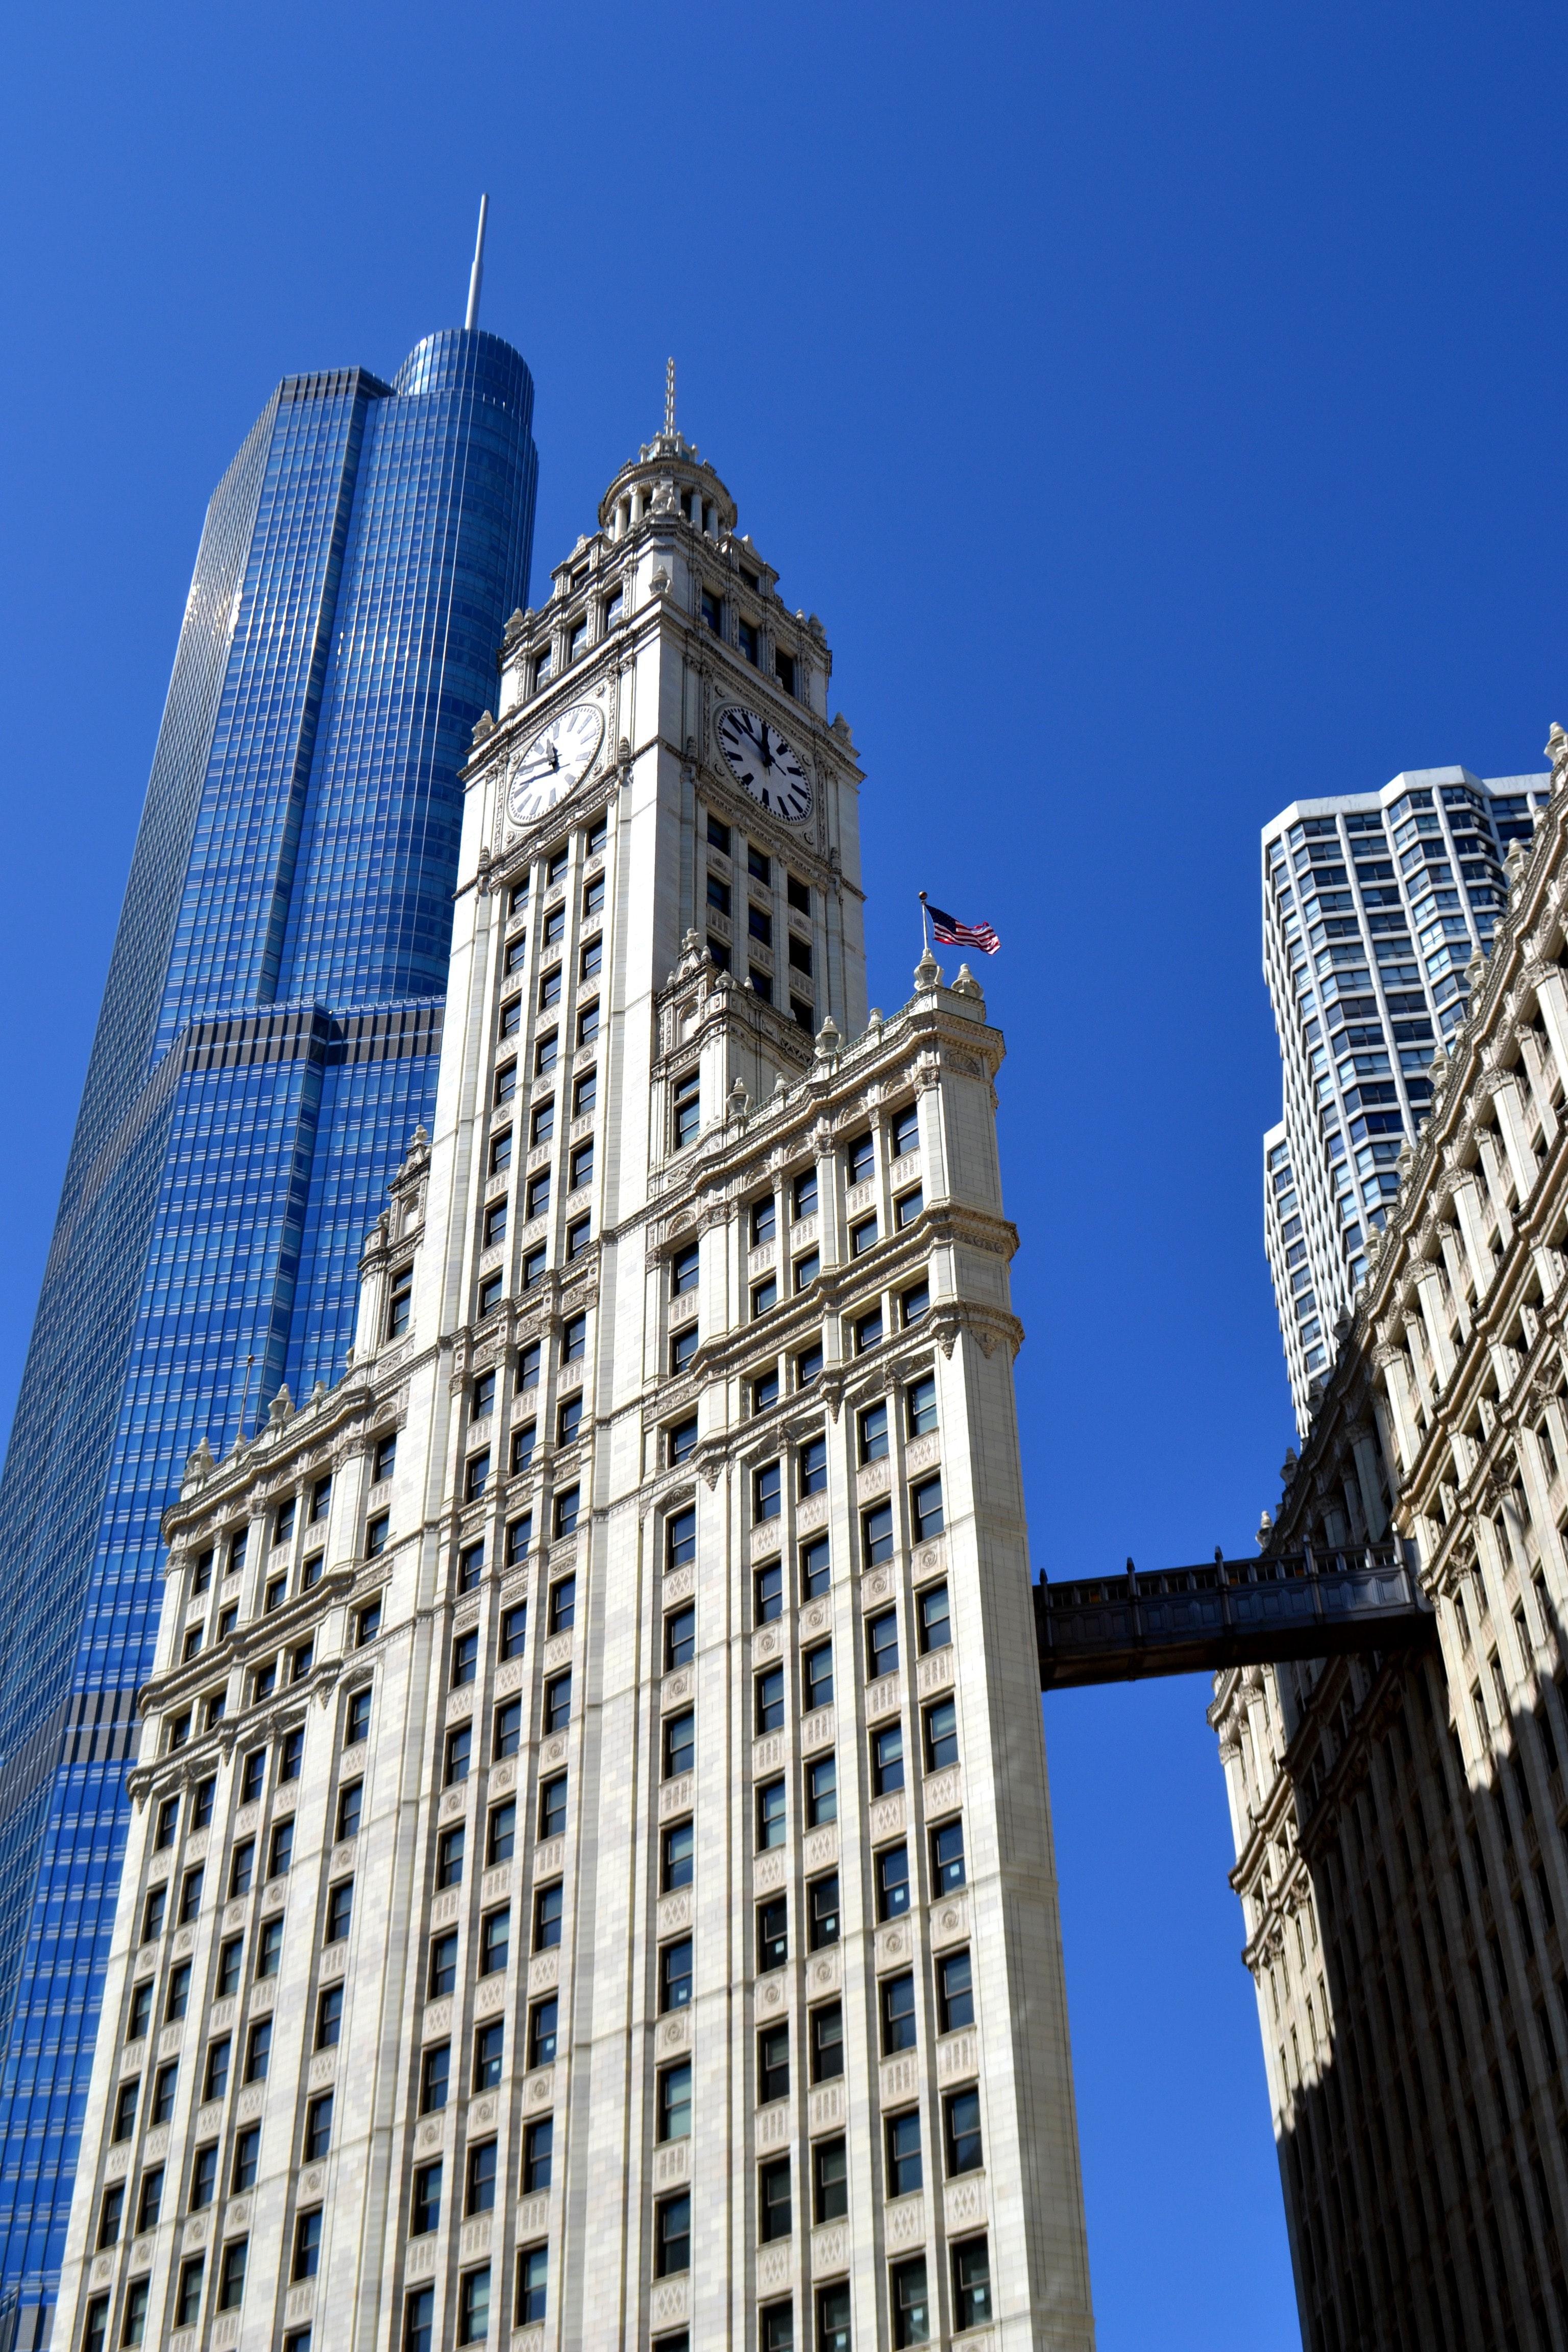 White Concrete Building on Daytime, Architecture, Buildings, City, Clock, HQ Photo